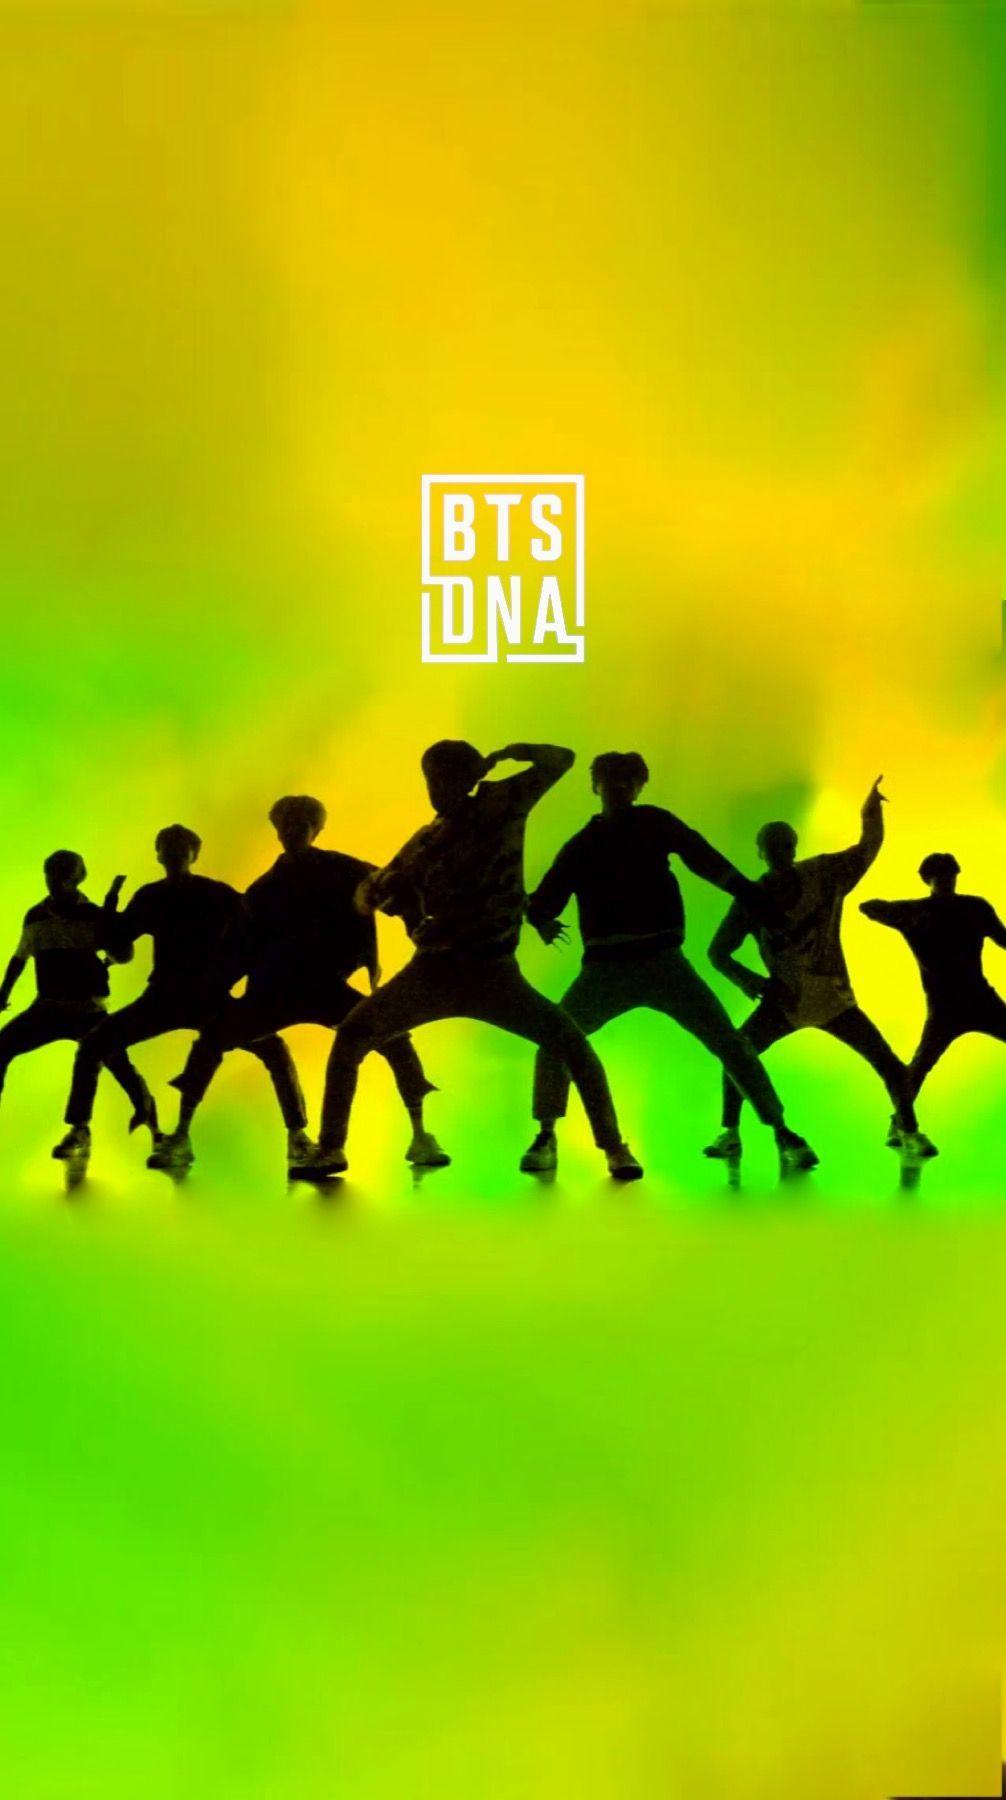 BTS DNA WALLPAPER BANGTAN RM JIN SUGA JHOPE JIMIN V JUNGKOOK …